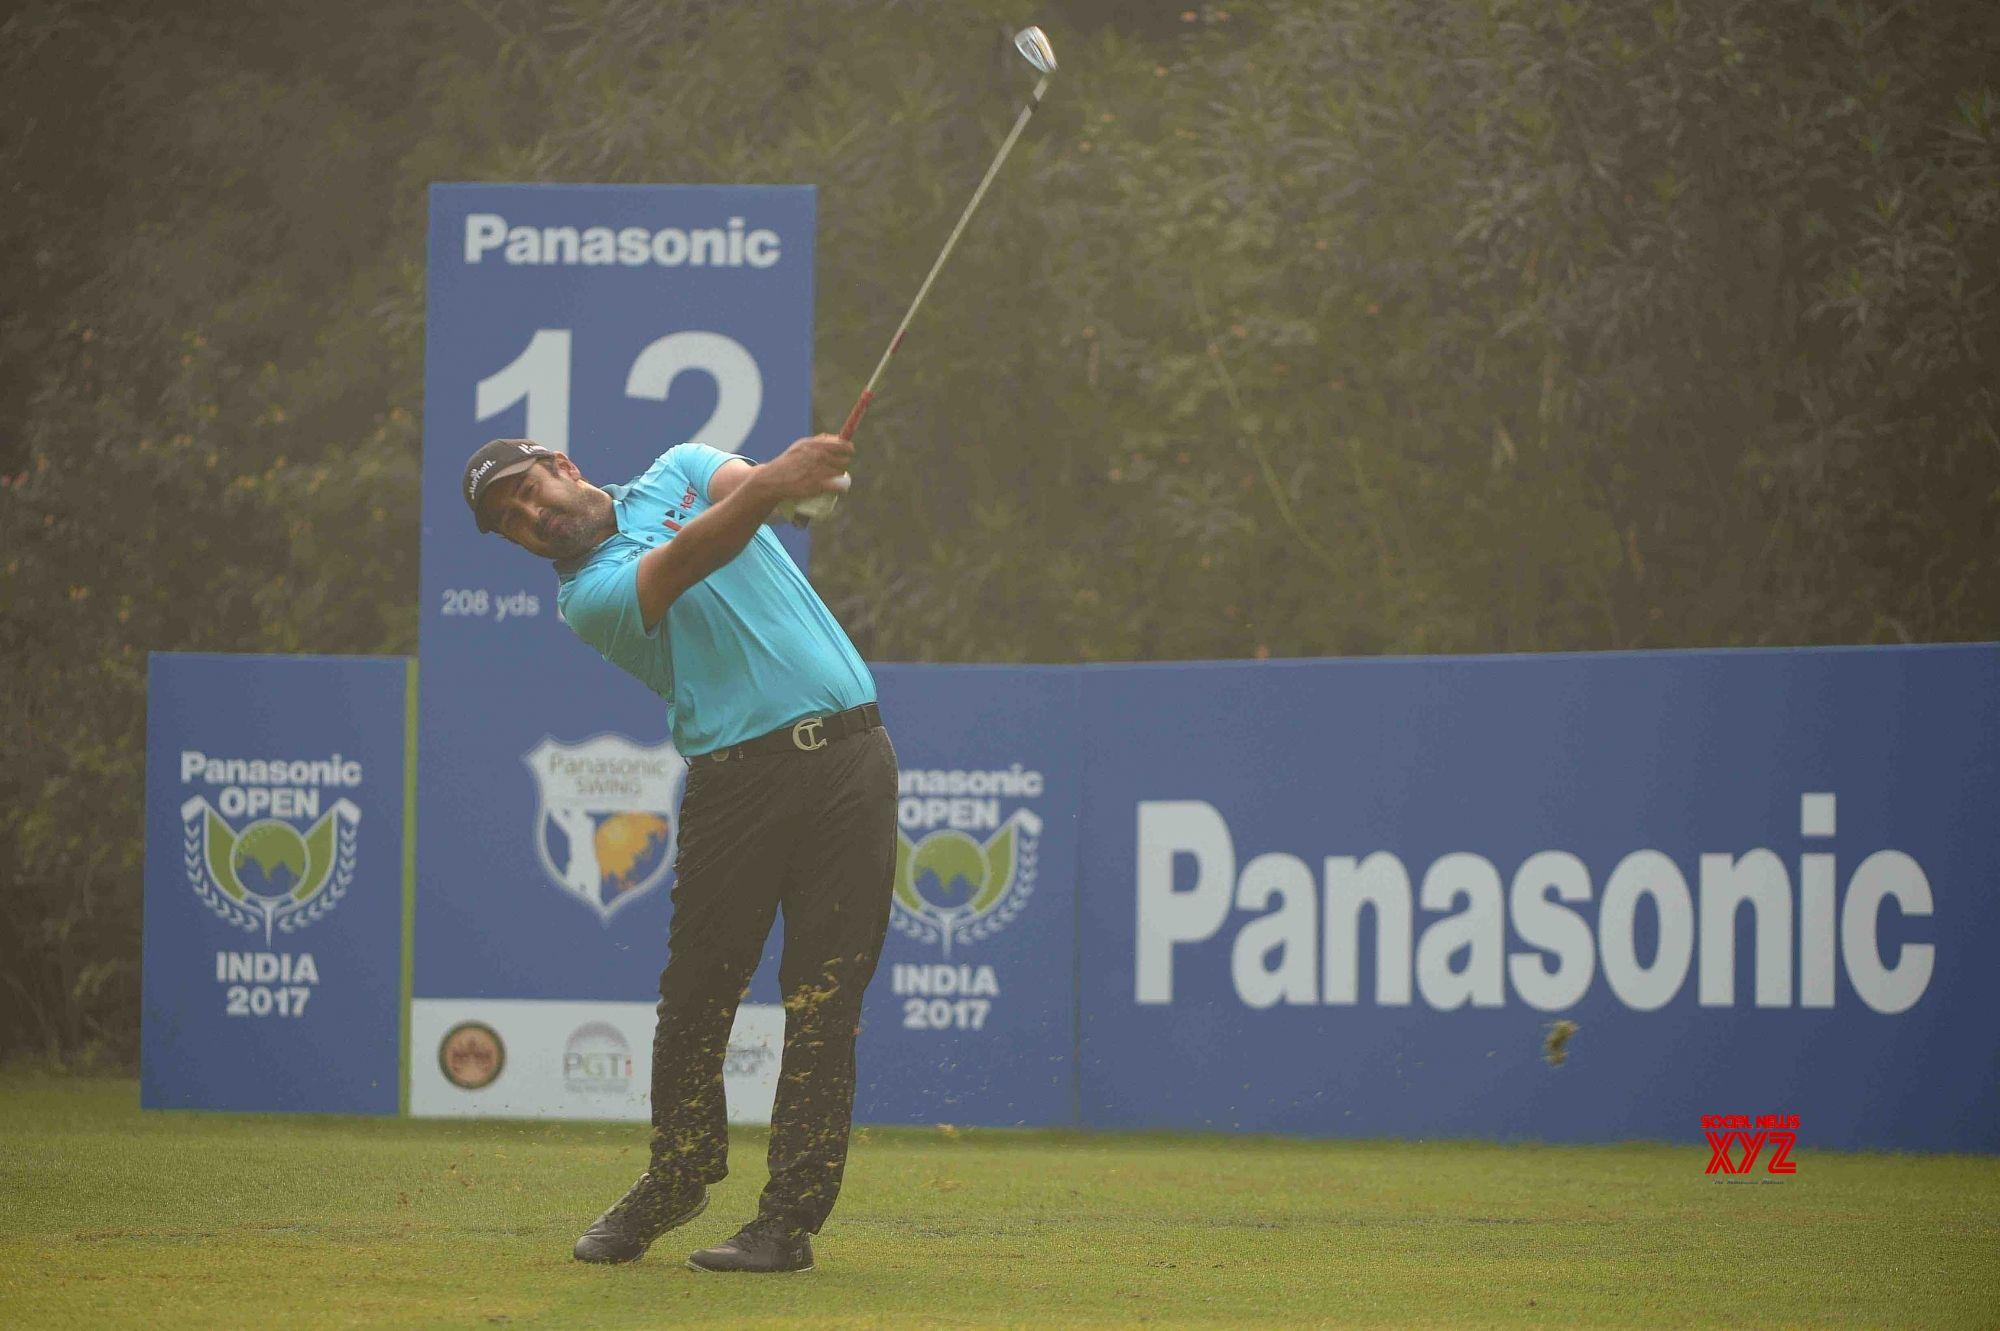 Shiv Kapur, Prasad, Dharma, Das tied third in Panasonic Open